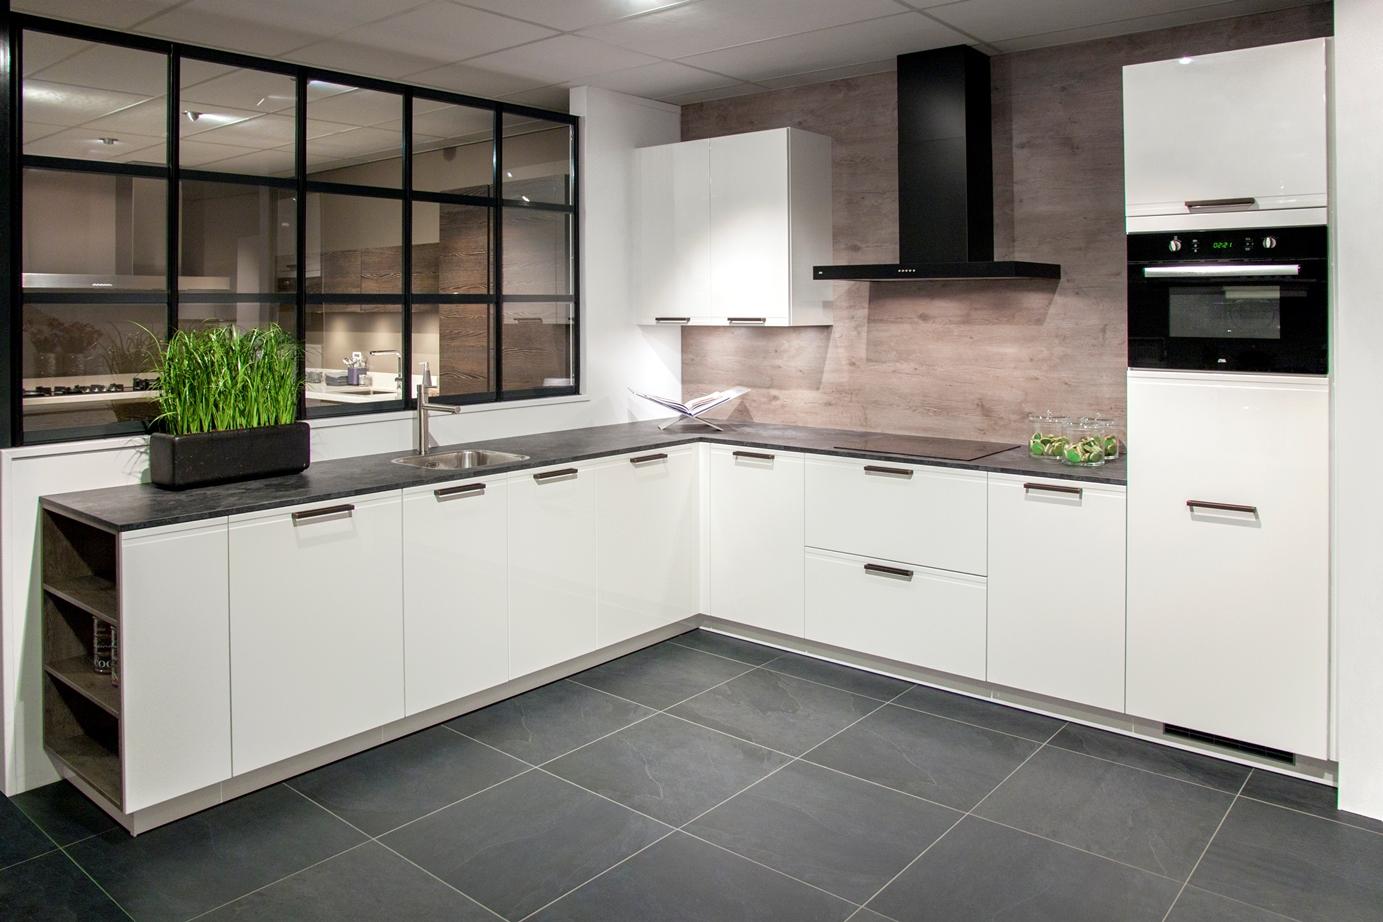 Goedkope Keukens Duitsland : Keukens duitsland duitse keukens laagste prijzen db keukens